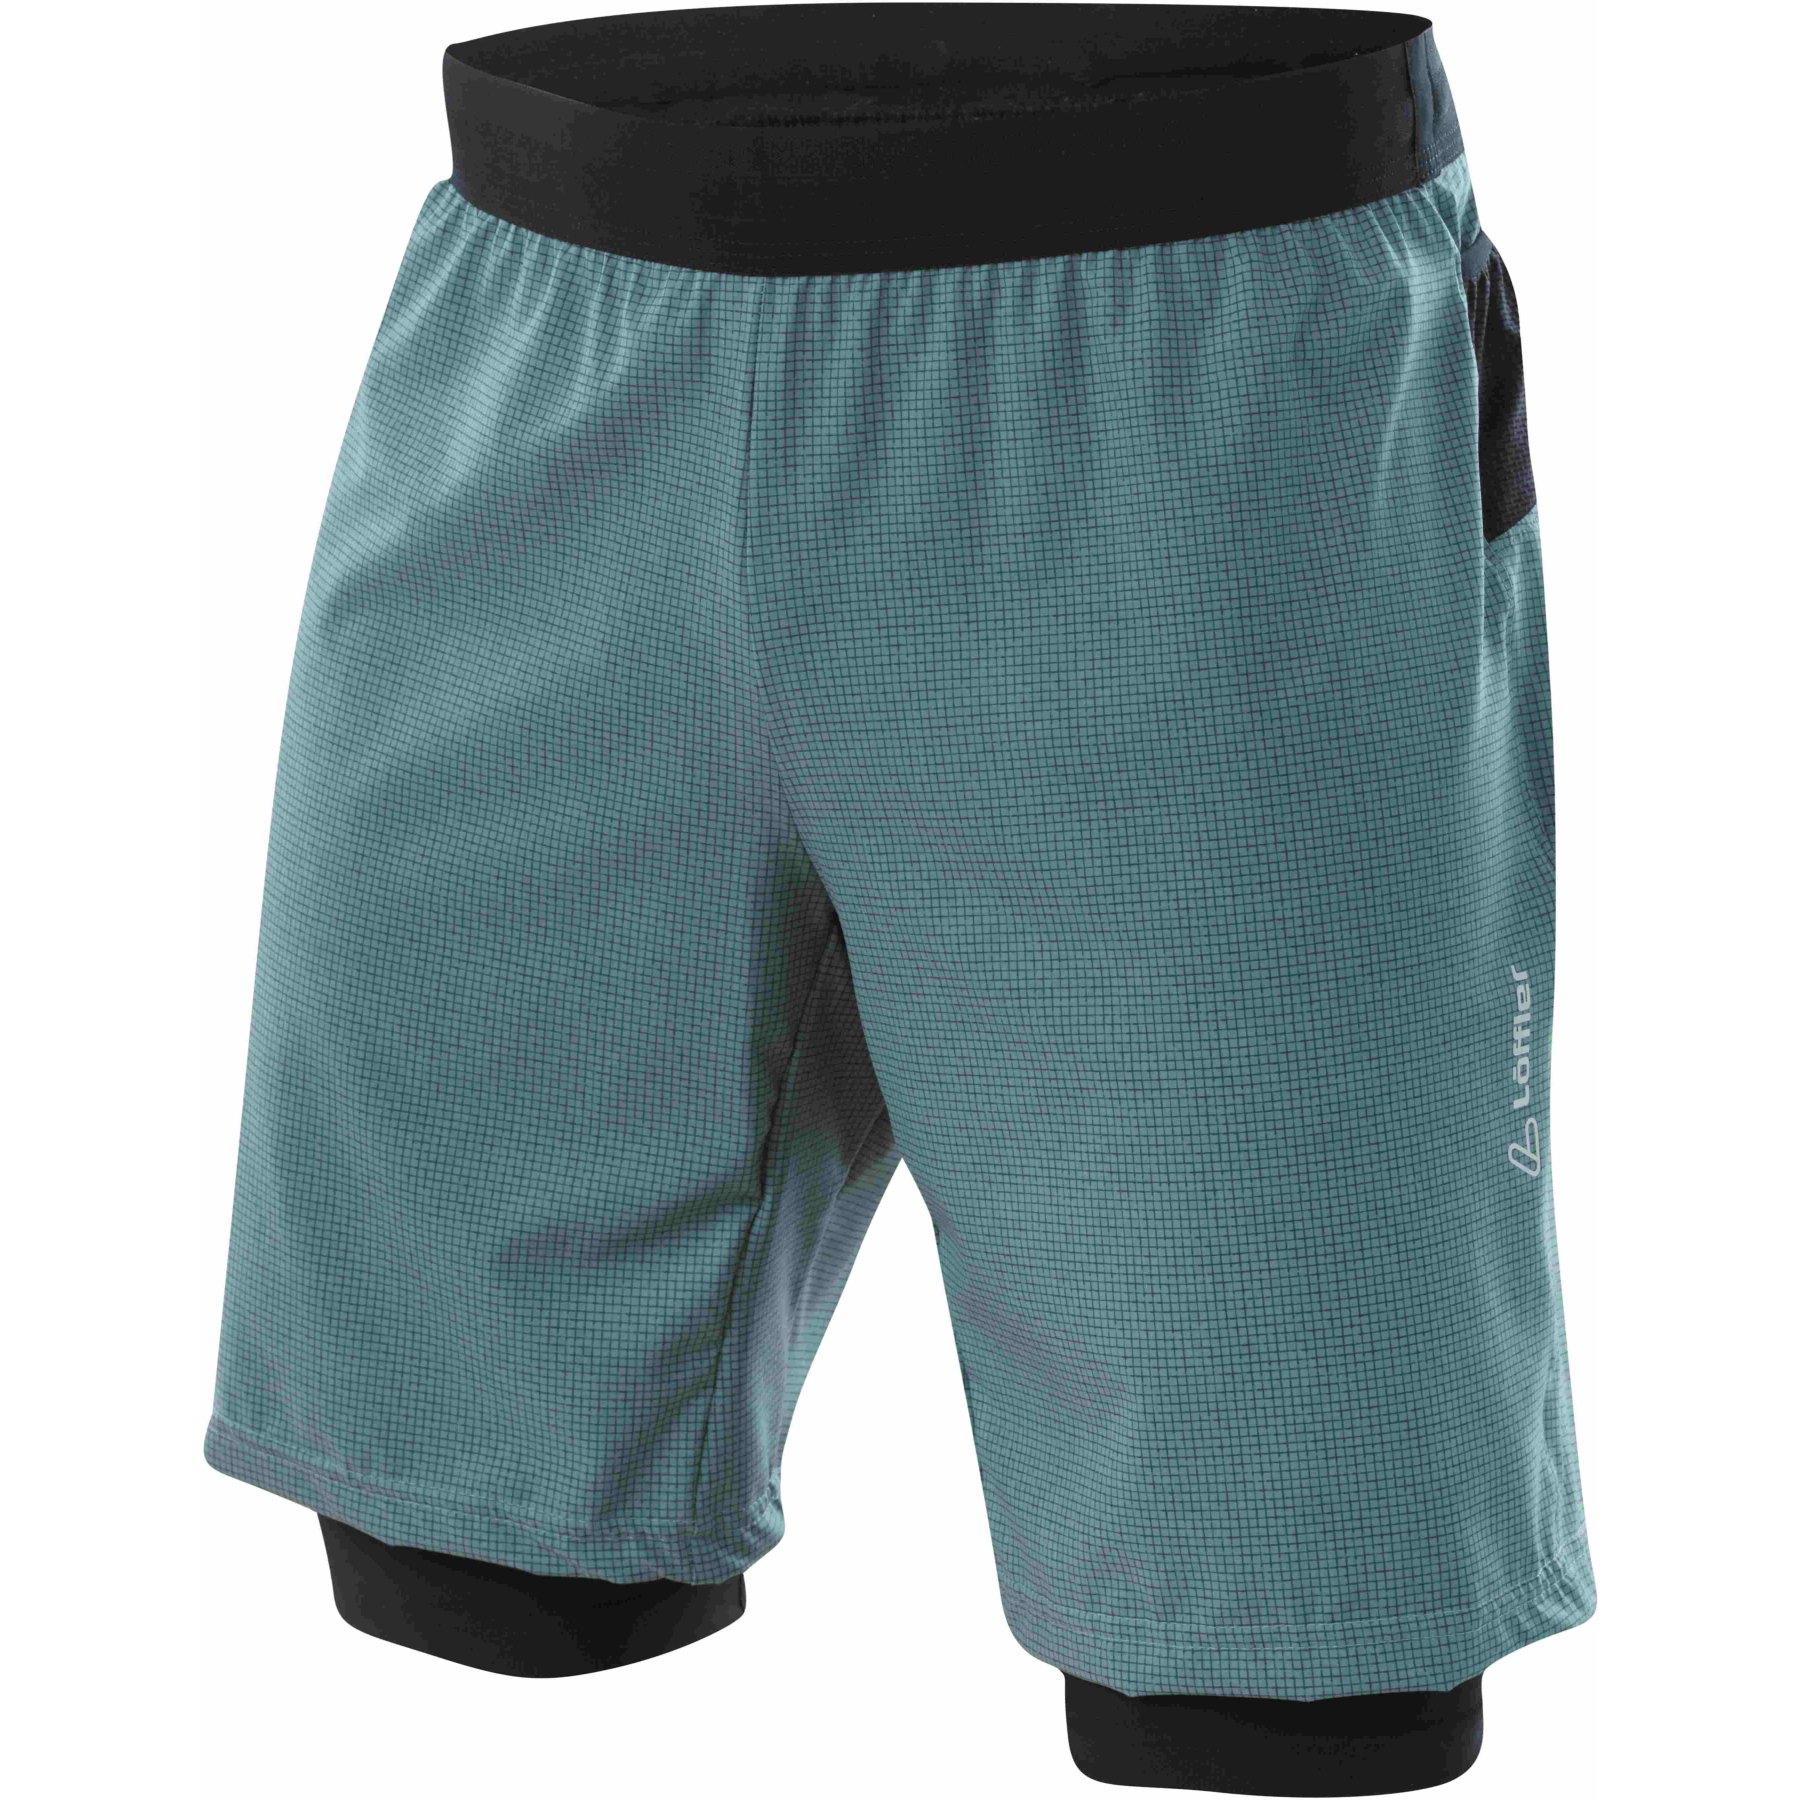 Picture of Löffler 2in1 Shorts CSSL 23592 - granite 940